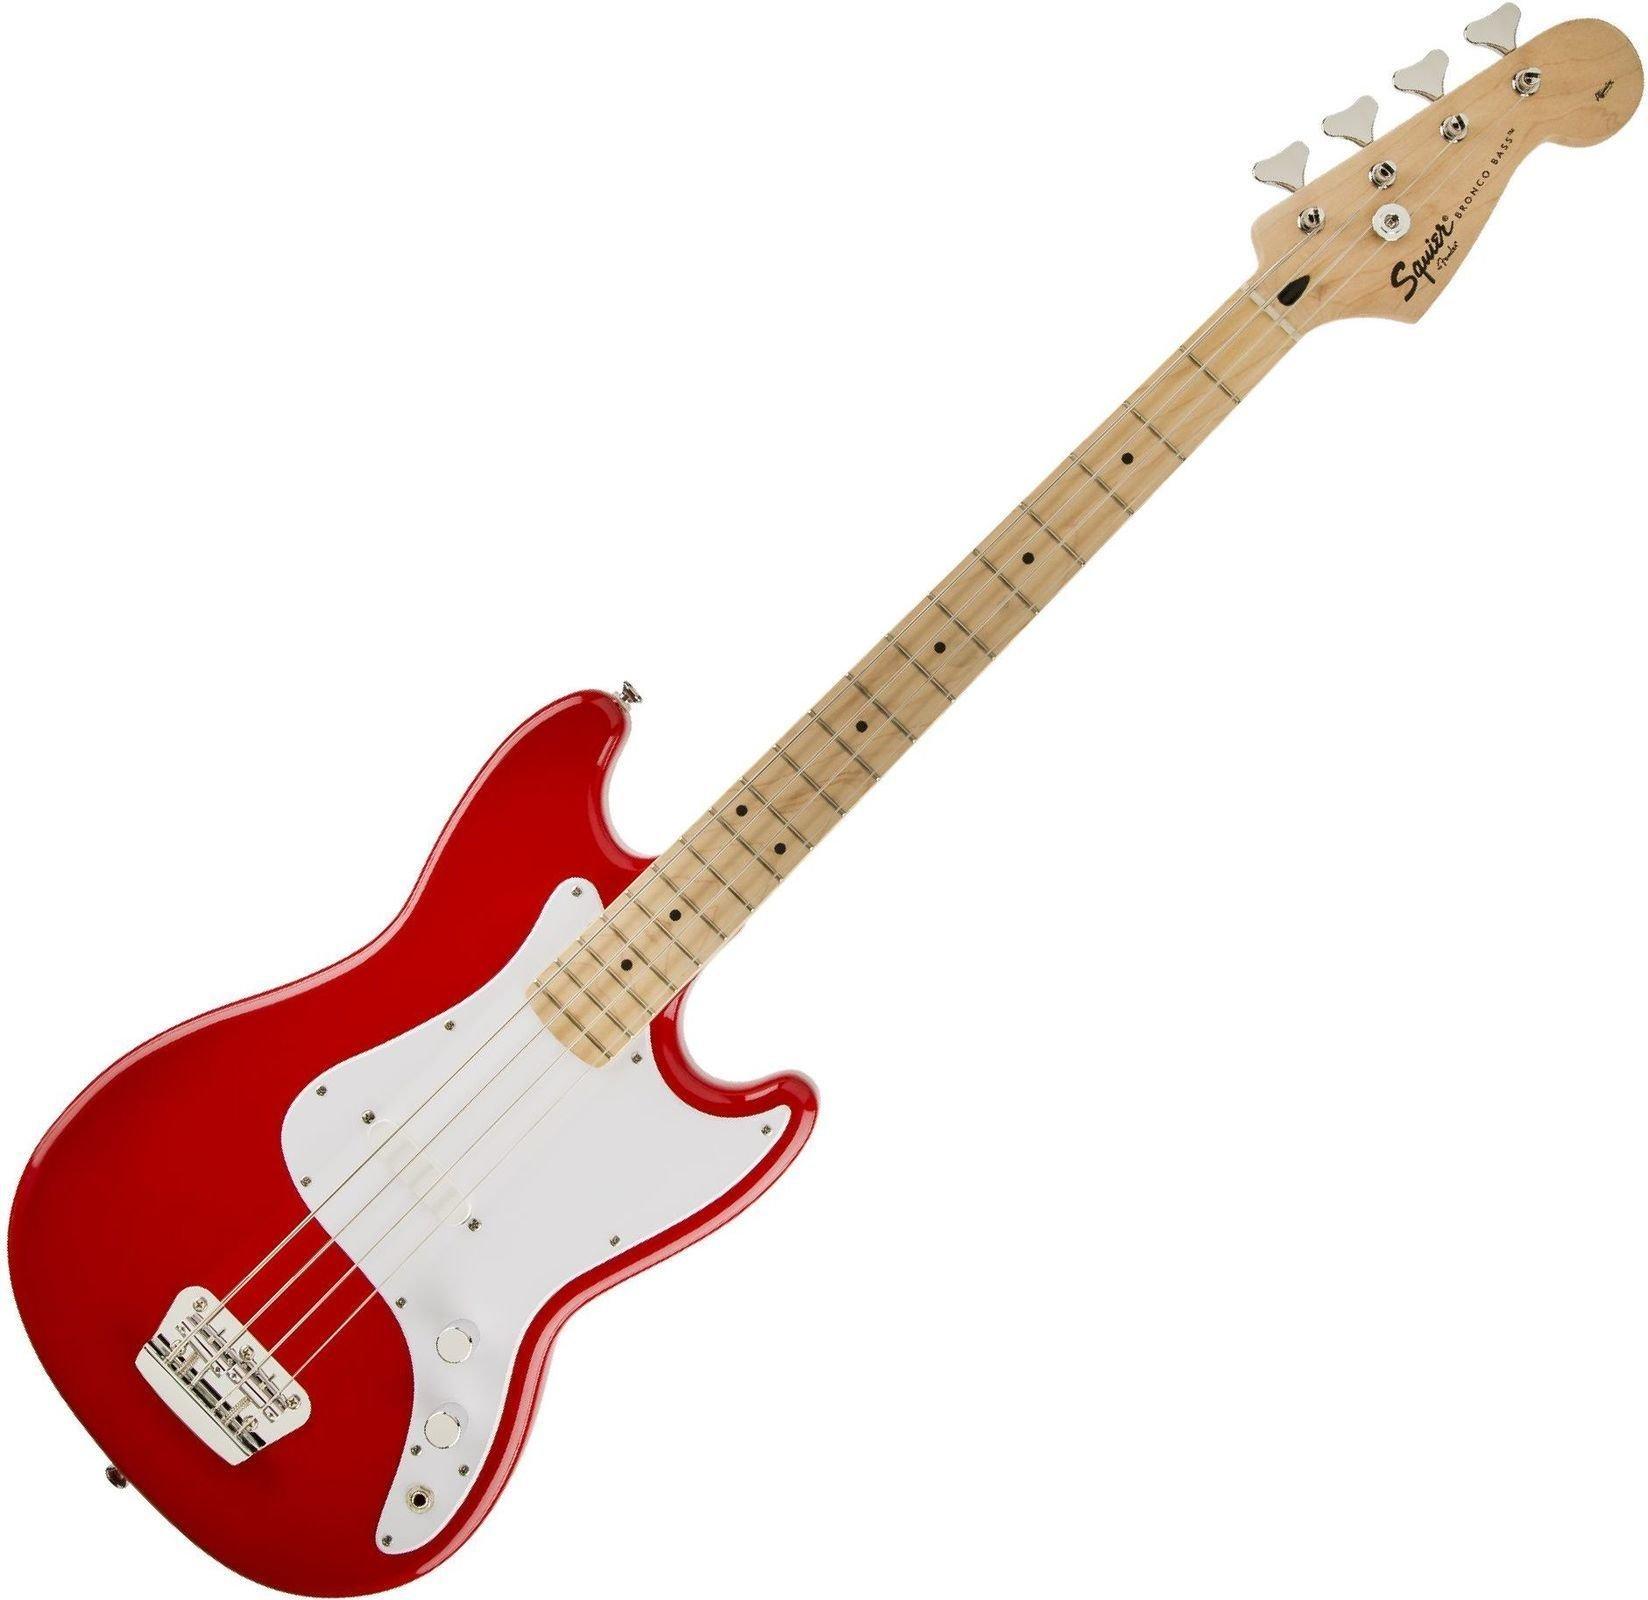 Guitare basse électrique Squier by Fender Bronco Bass - Torino Red